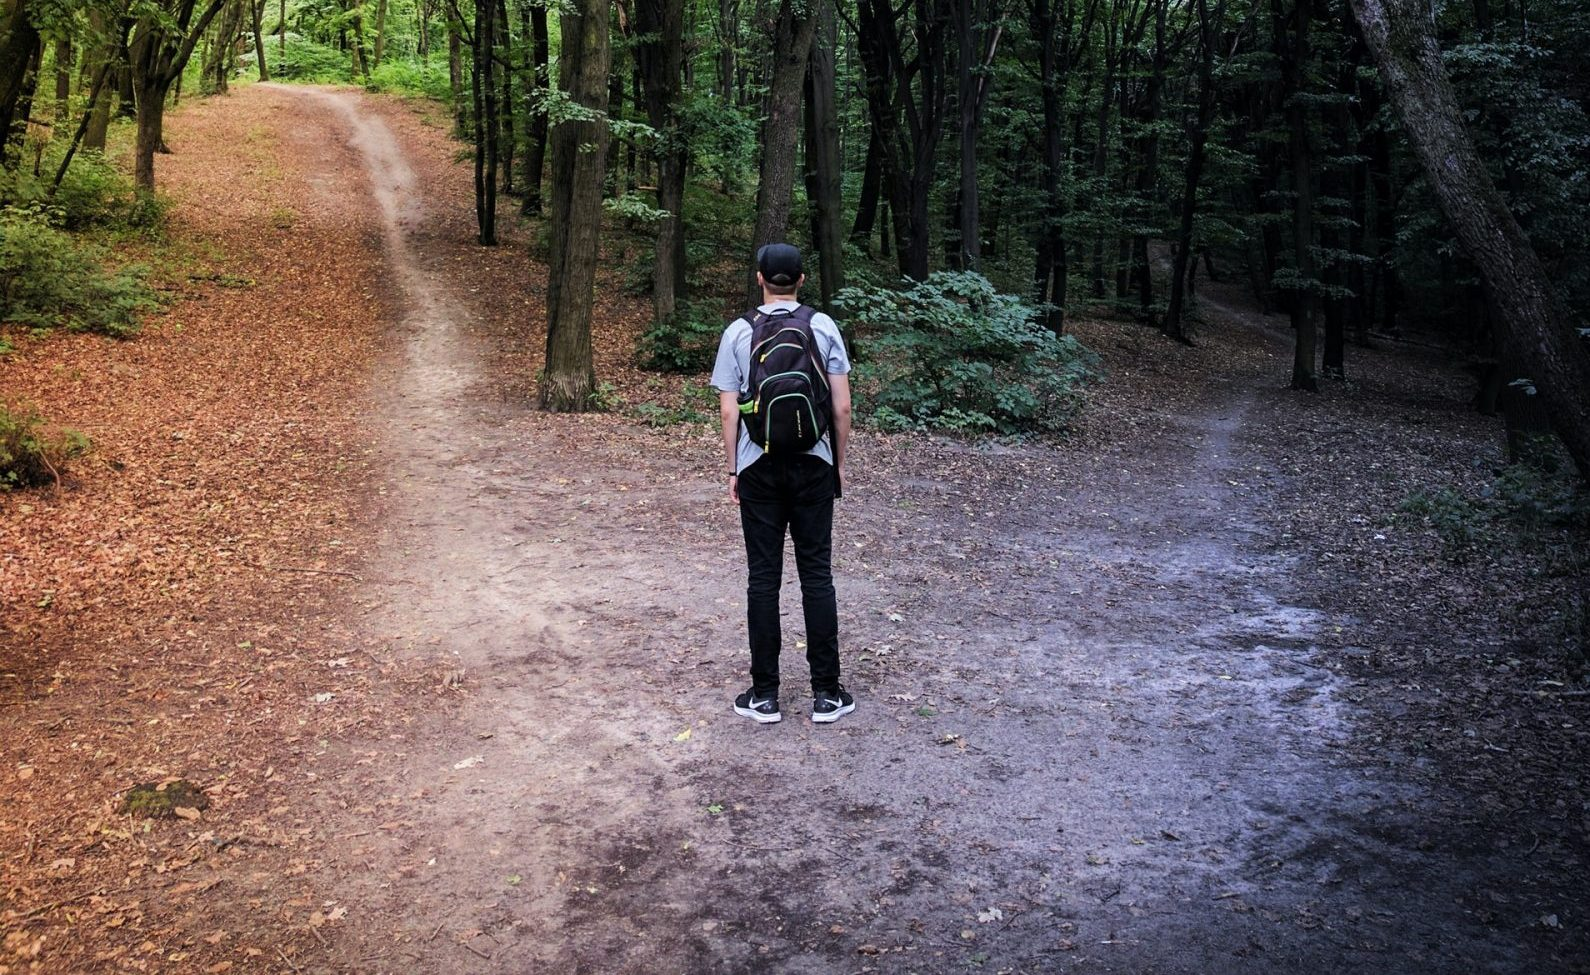 Student at Crossroads